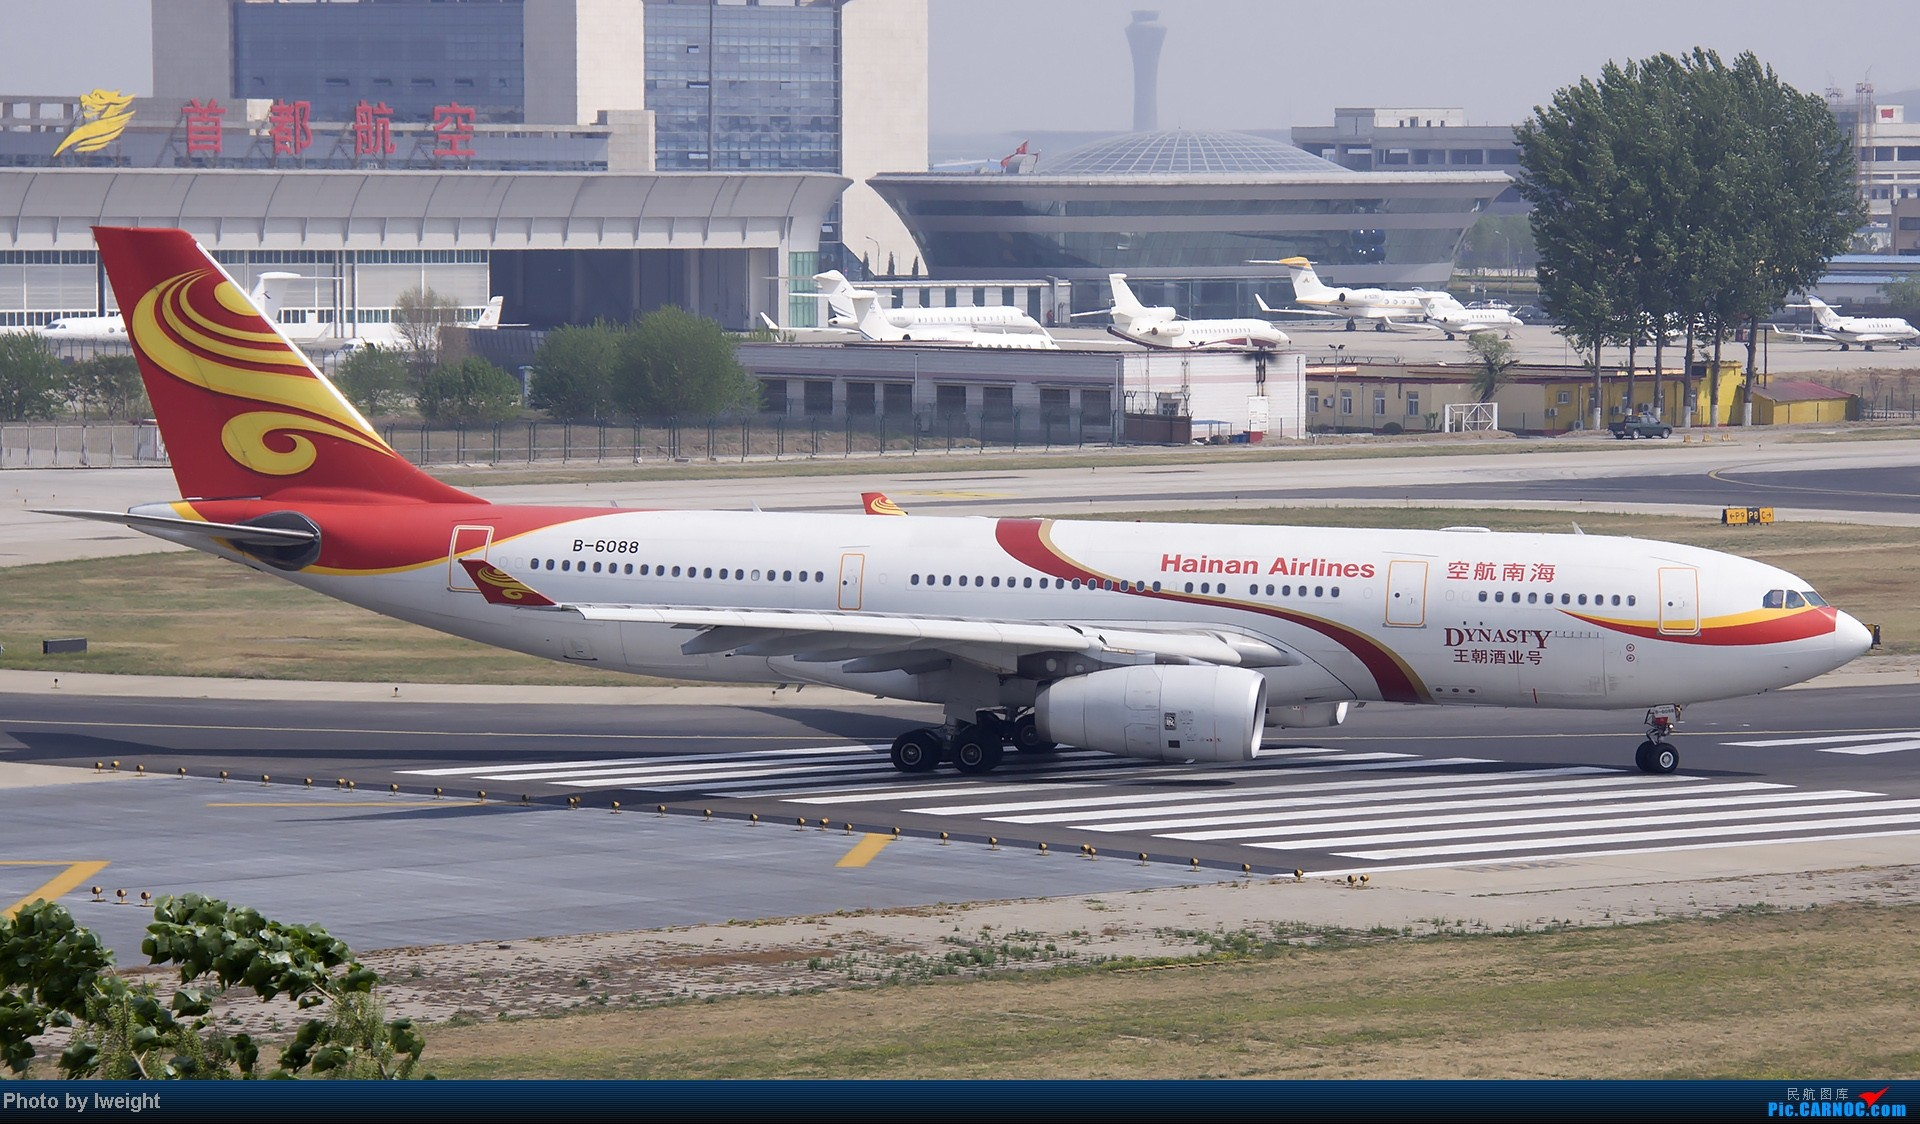 Re:[原创]错过了卡航的巴塞罗那号,只有这些大路货了,泪奔啊 AIRBUS A330-200 B-6088 中国北京首都机场